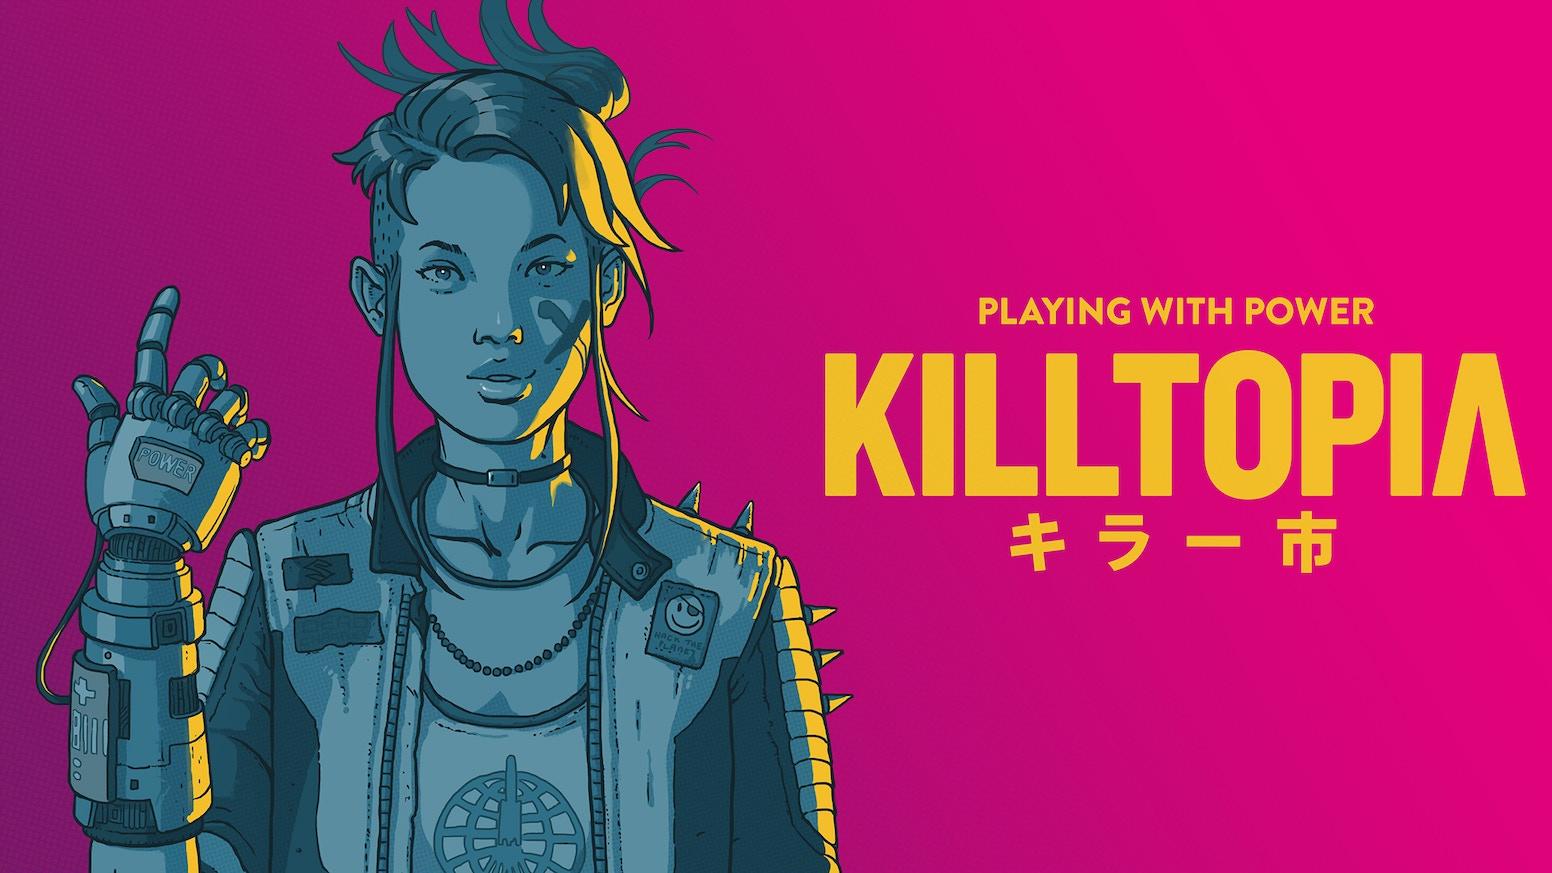 Cyberpunk Tokyo becomes a high tech battleground as Japan's deadliest bounty hunters fight to claim the world's first sentient Mecha.